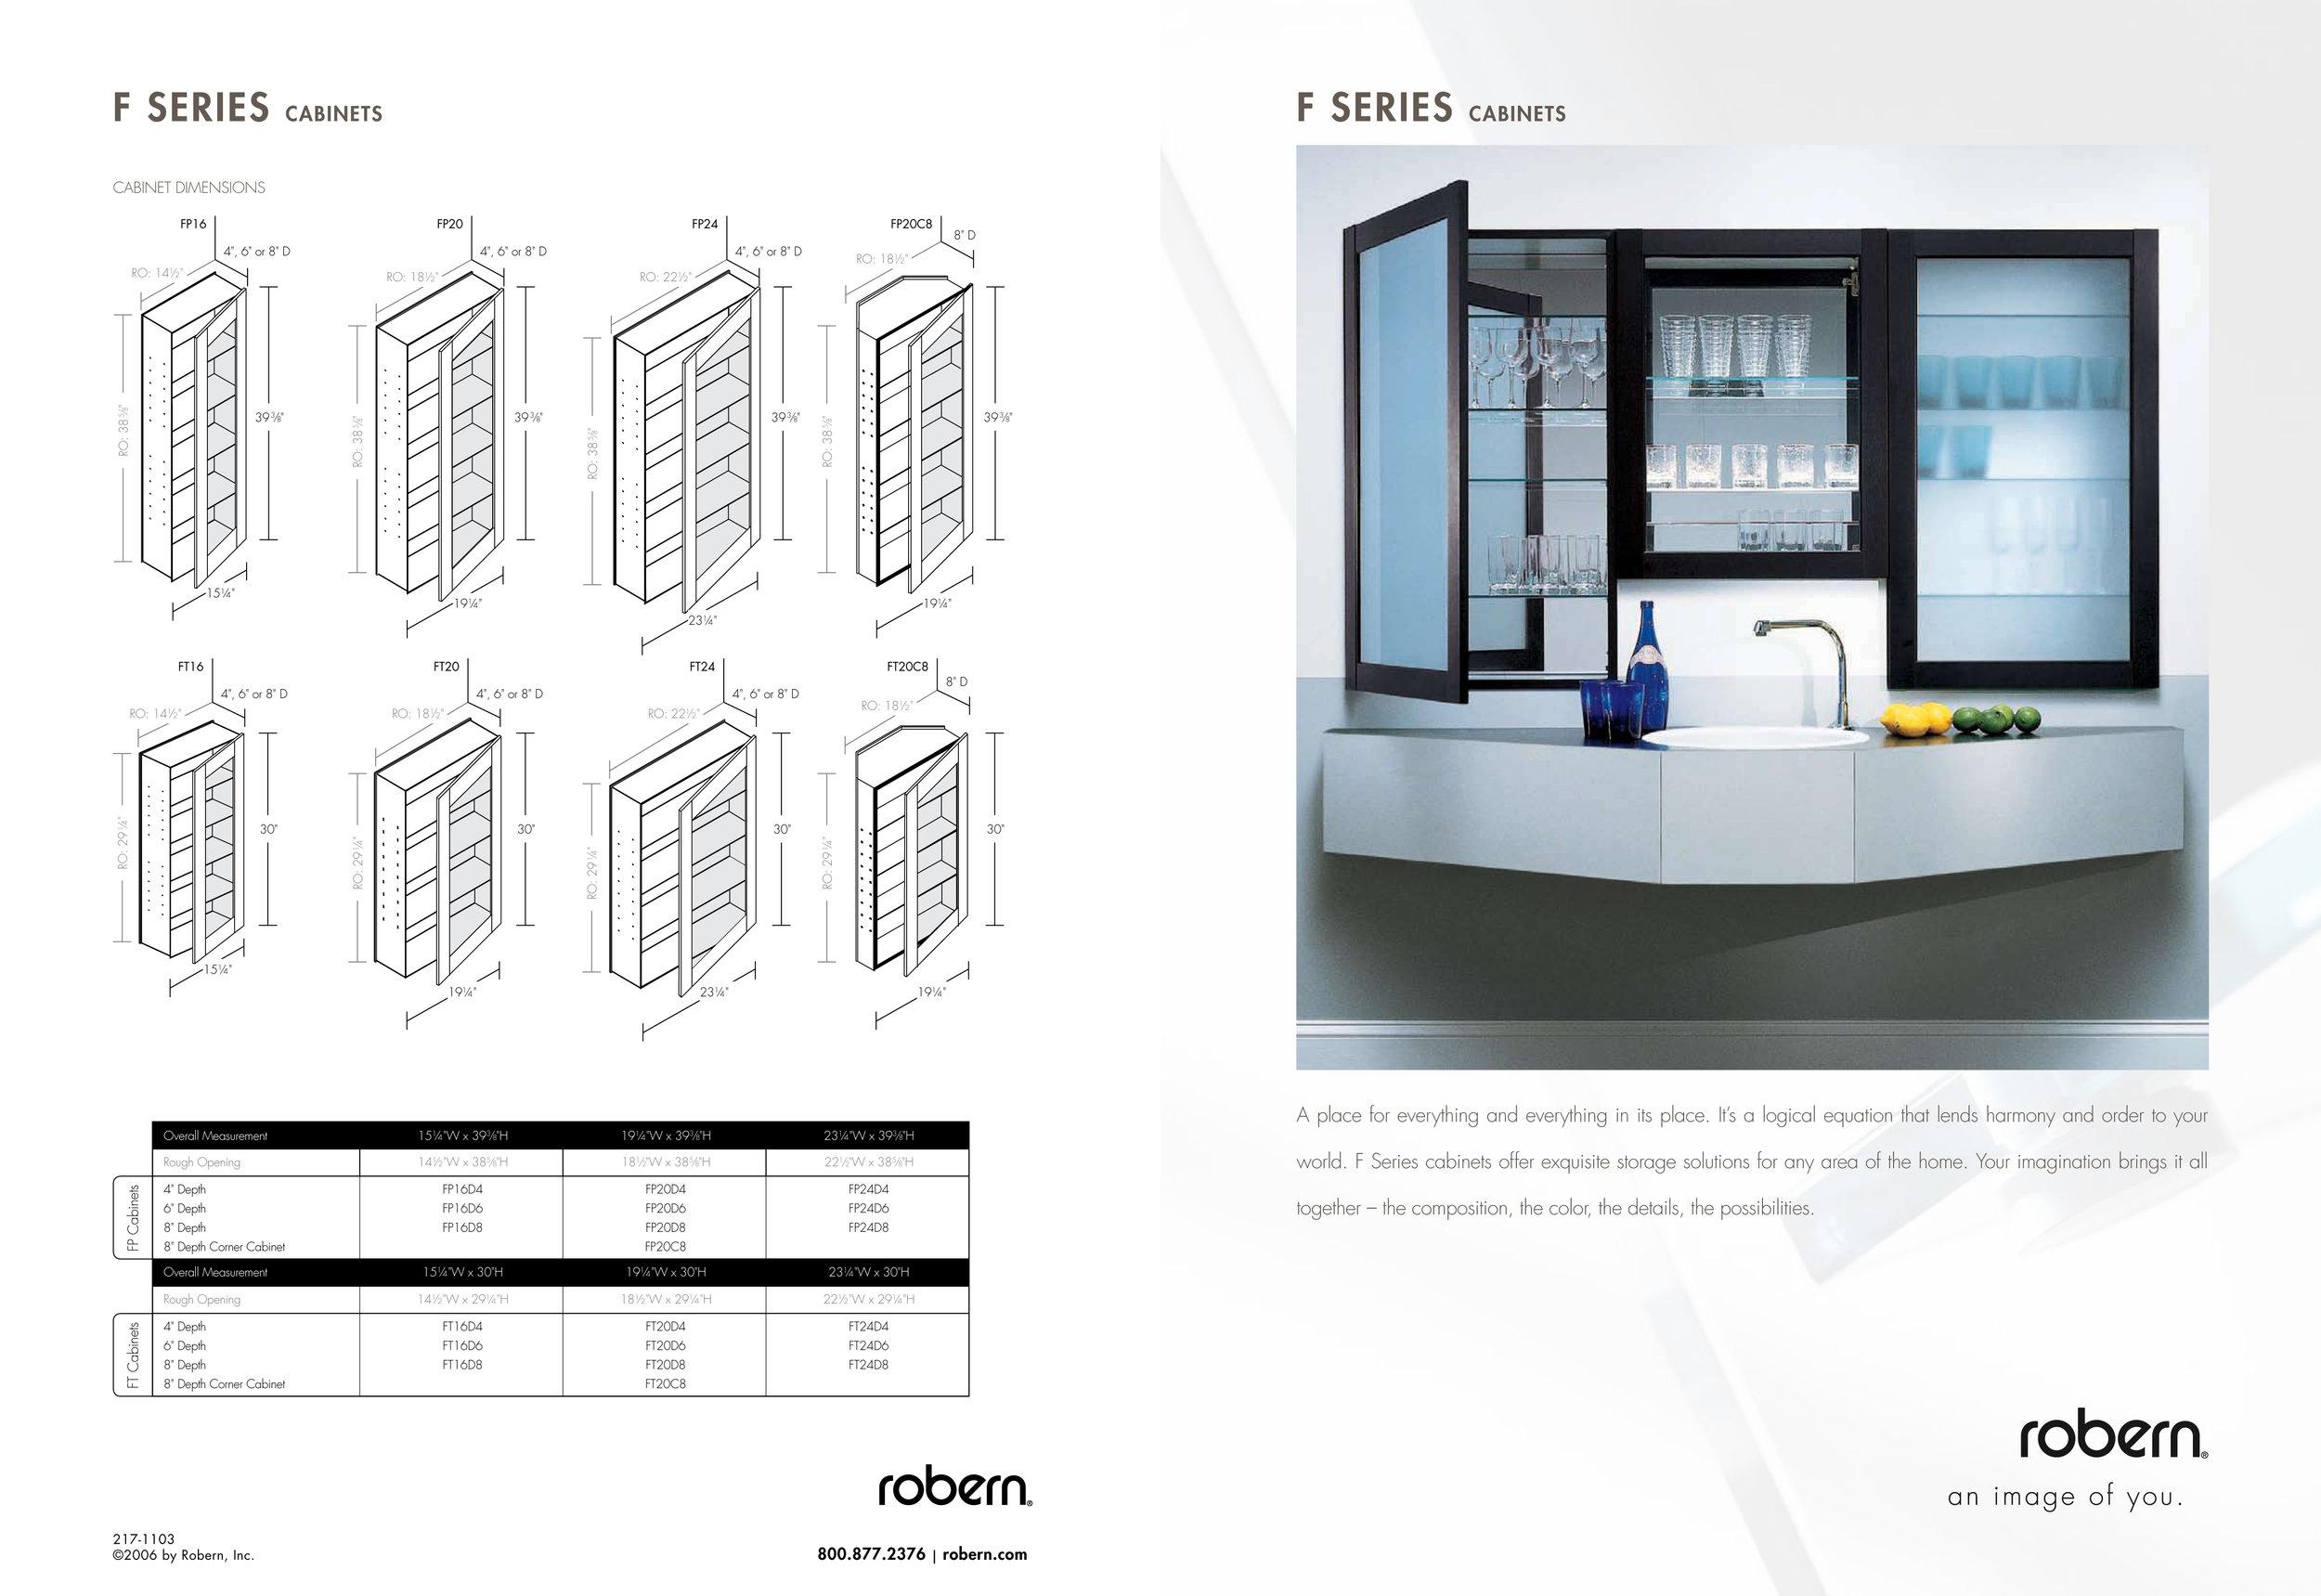 Robern F series spec sheet-1.jpg